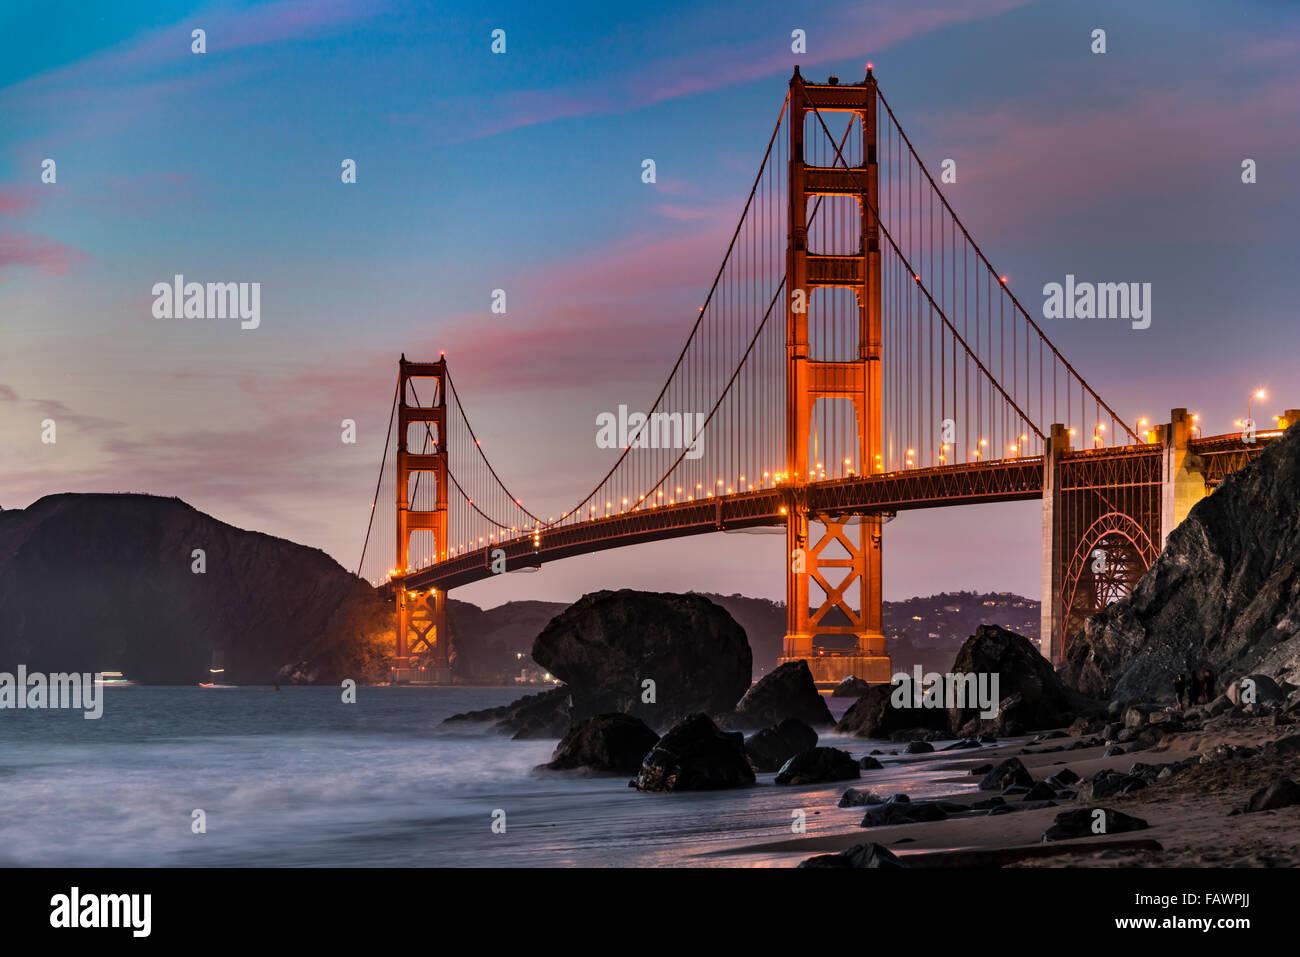 Golden Gate Bridge, Marshalls Strand, Nacht, Felsküste, San Francisco, USA Stockbild